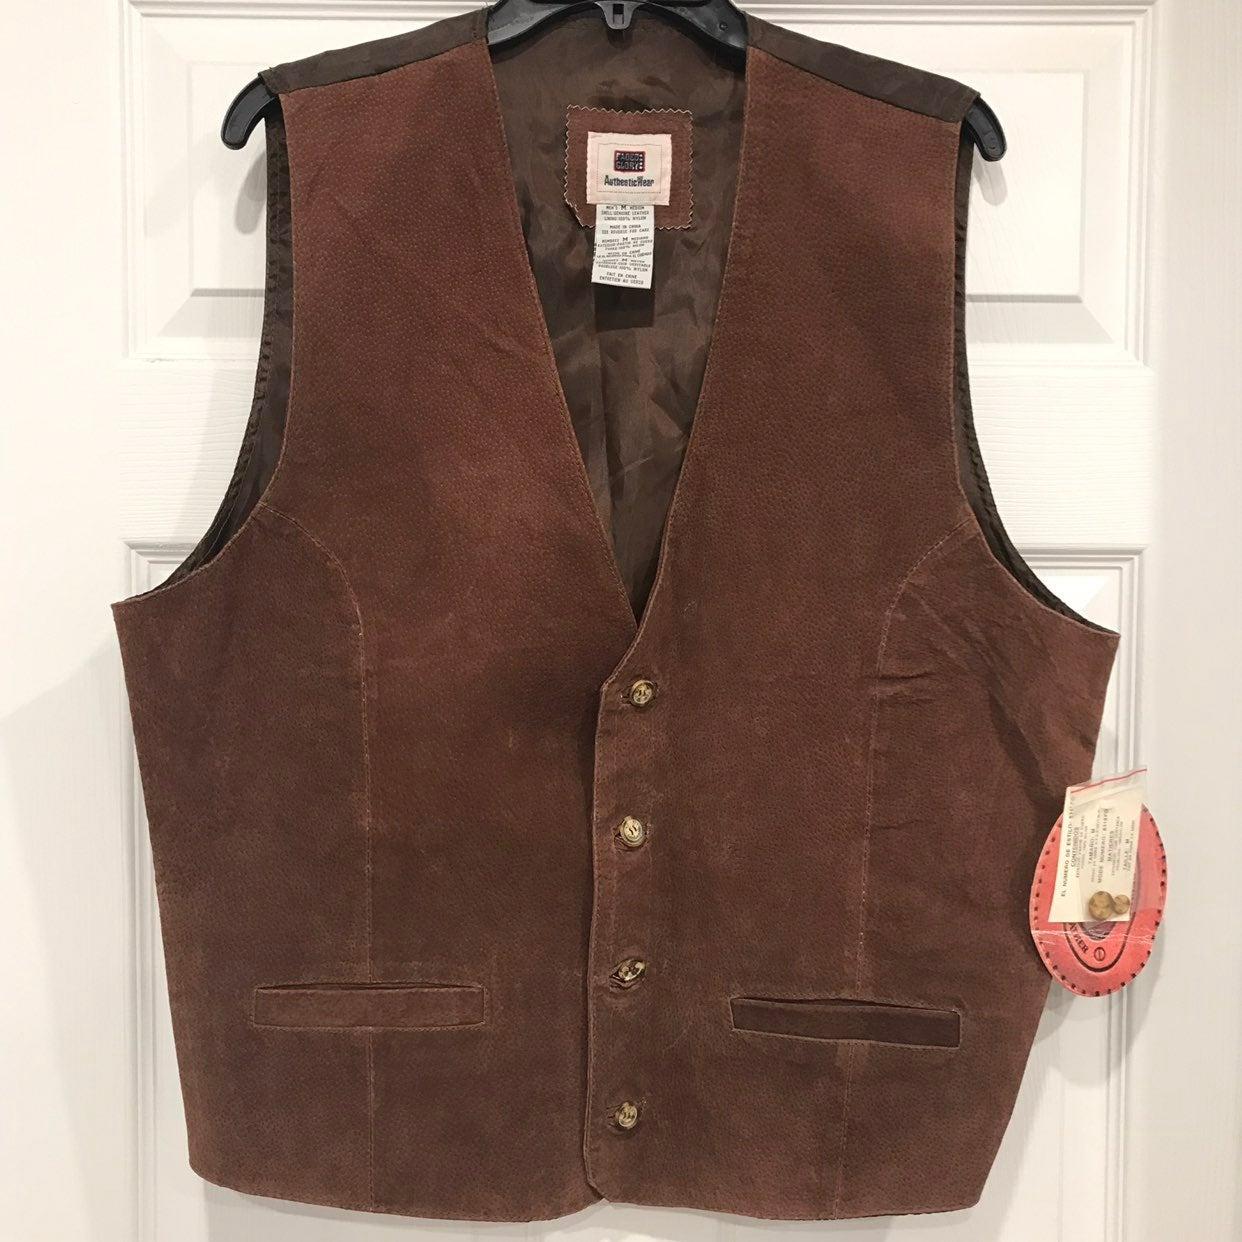 NWT Men's Brown Leather Vest